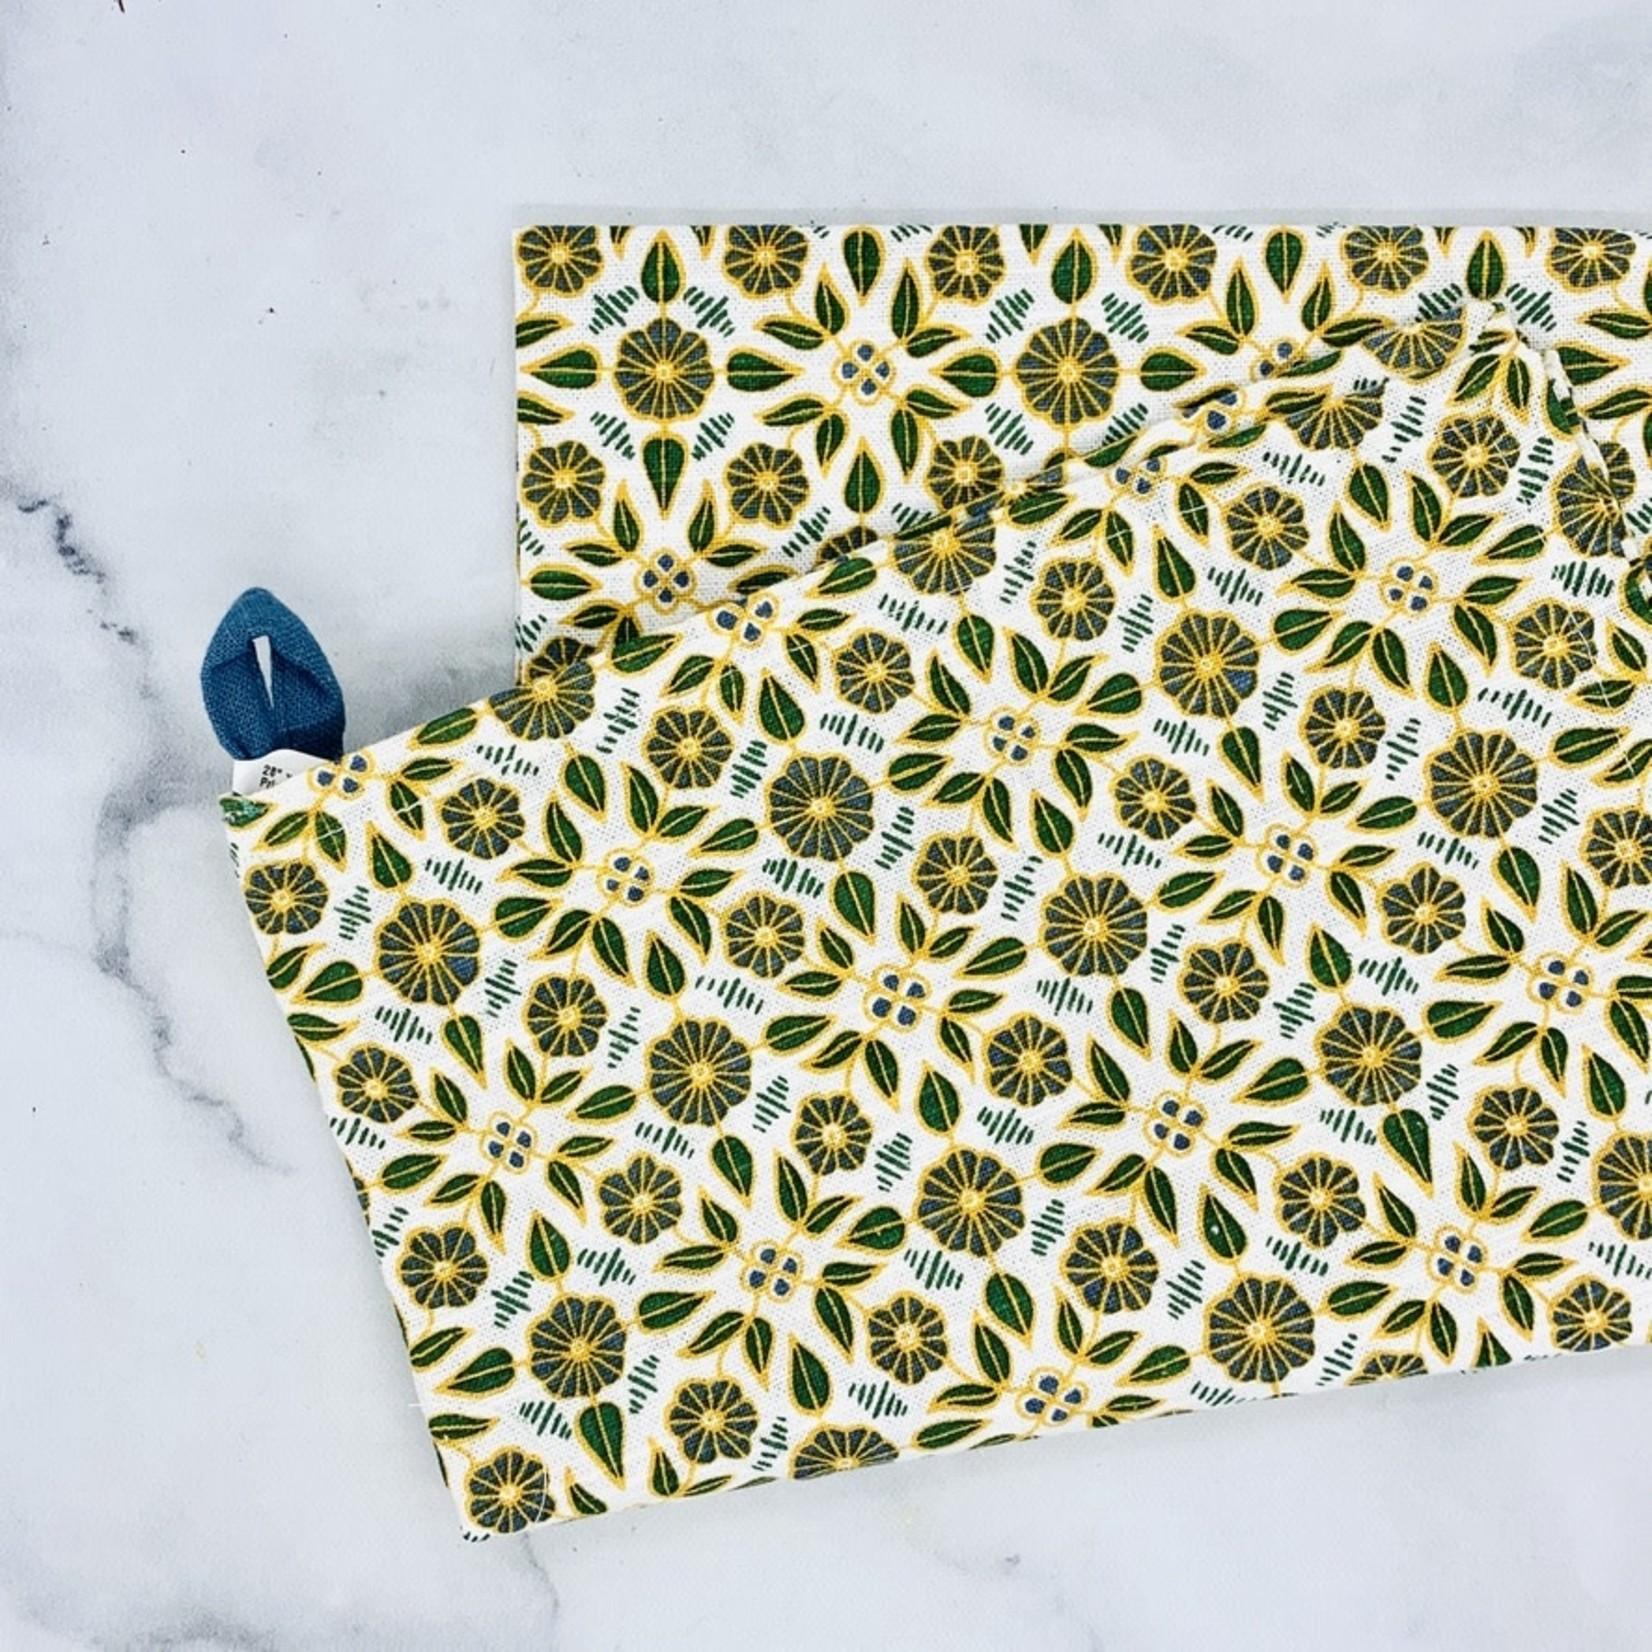 "28"" x 18"" Cotton Printed Tea Towel"